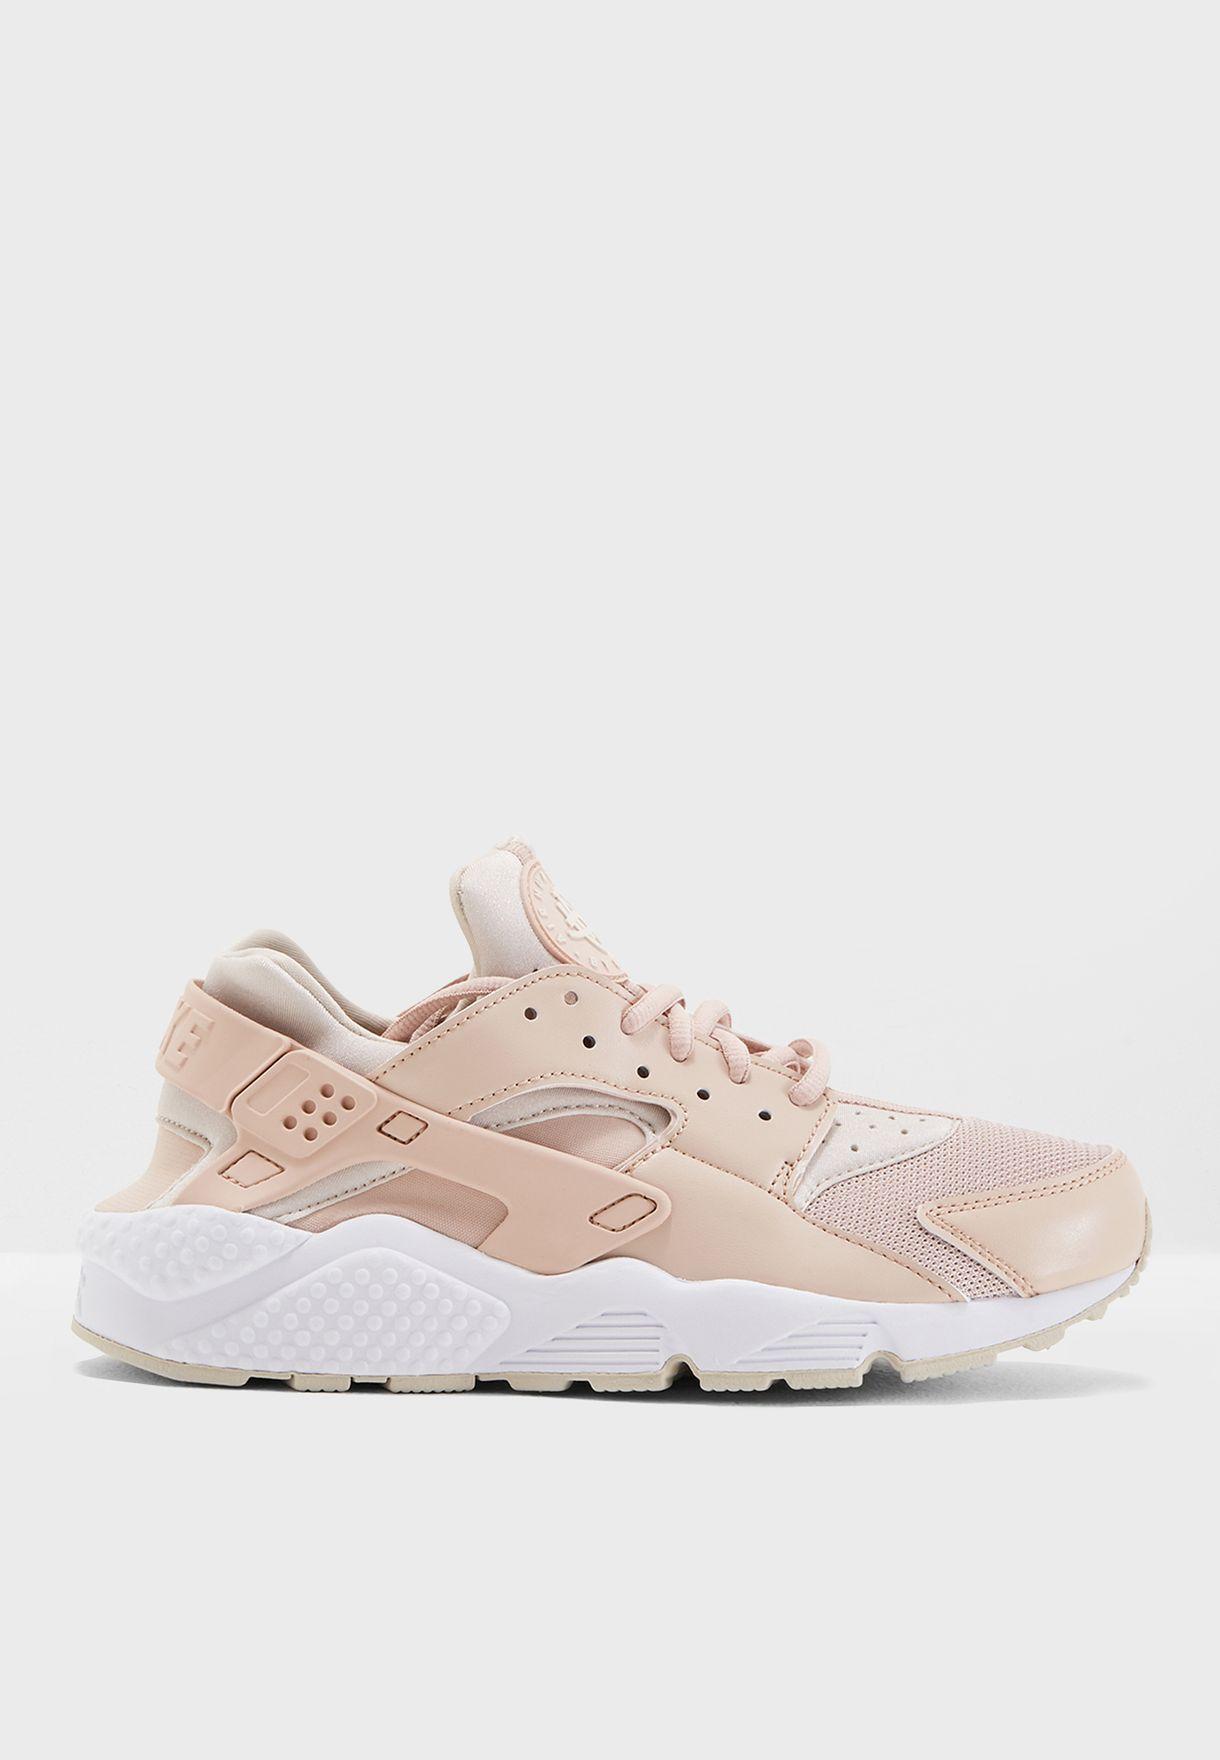 9b2c084dae73 Shop Nike pink Air Huarache Run 634835-202 for Women in UAE ...